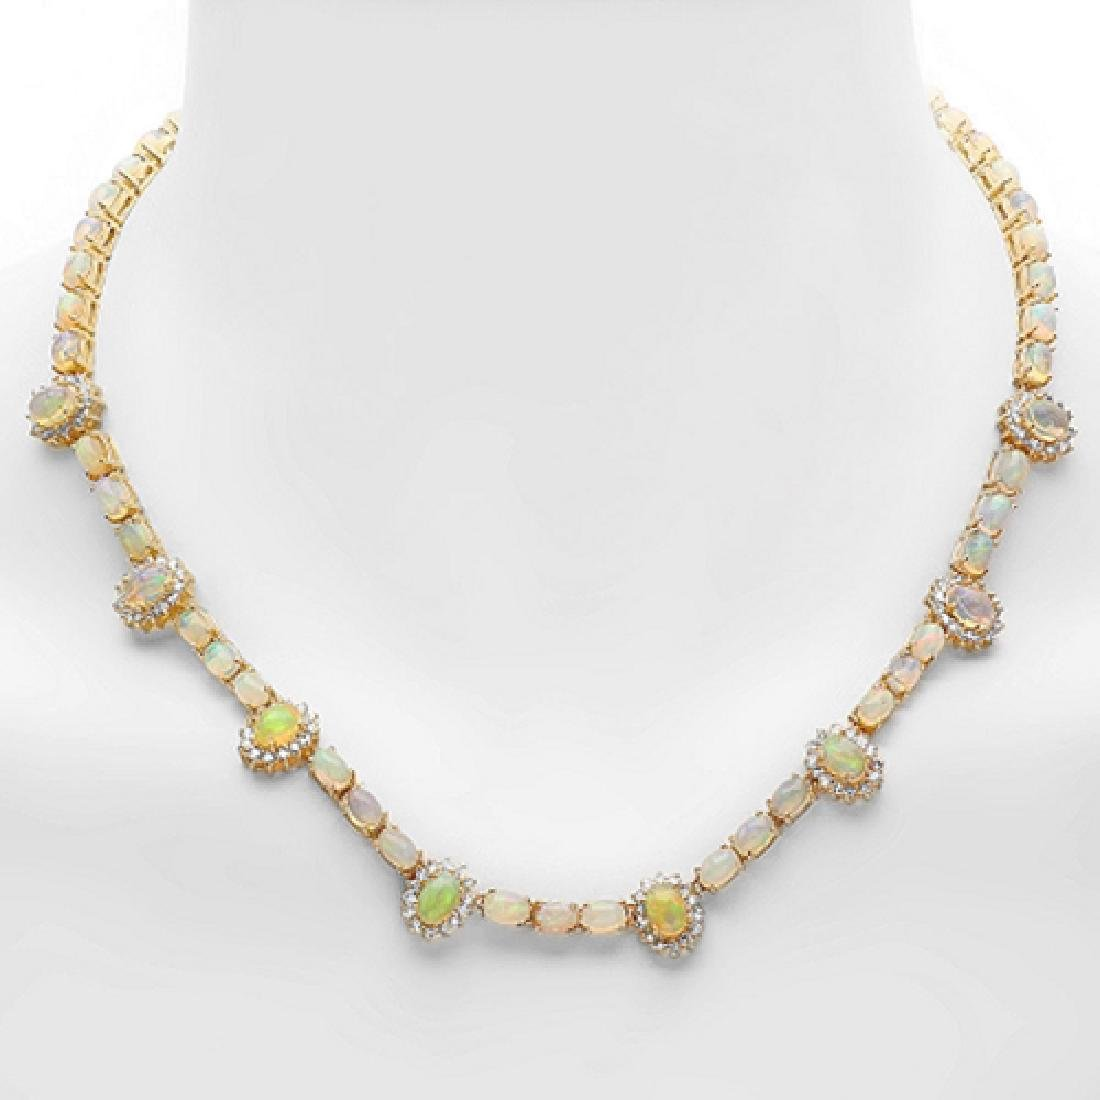 24.86 Carat Natural Opal 18K Solid Yellow Gold Diamond